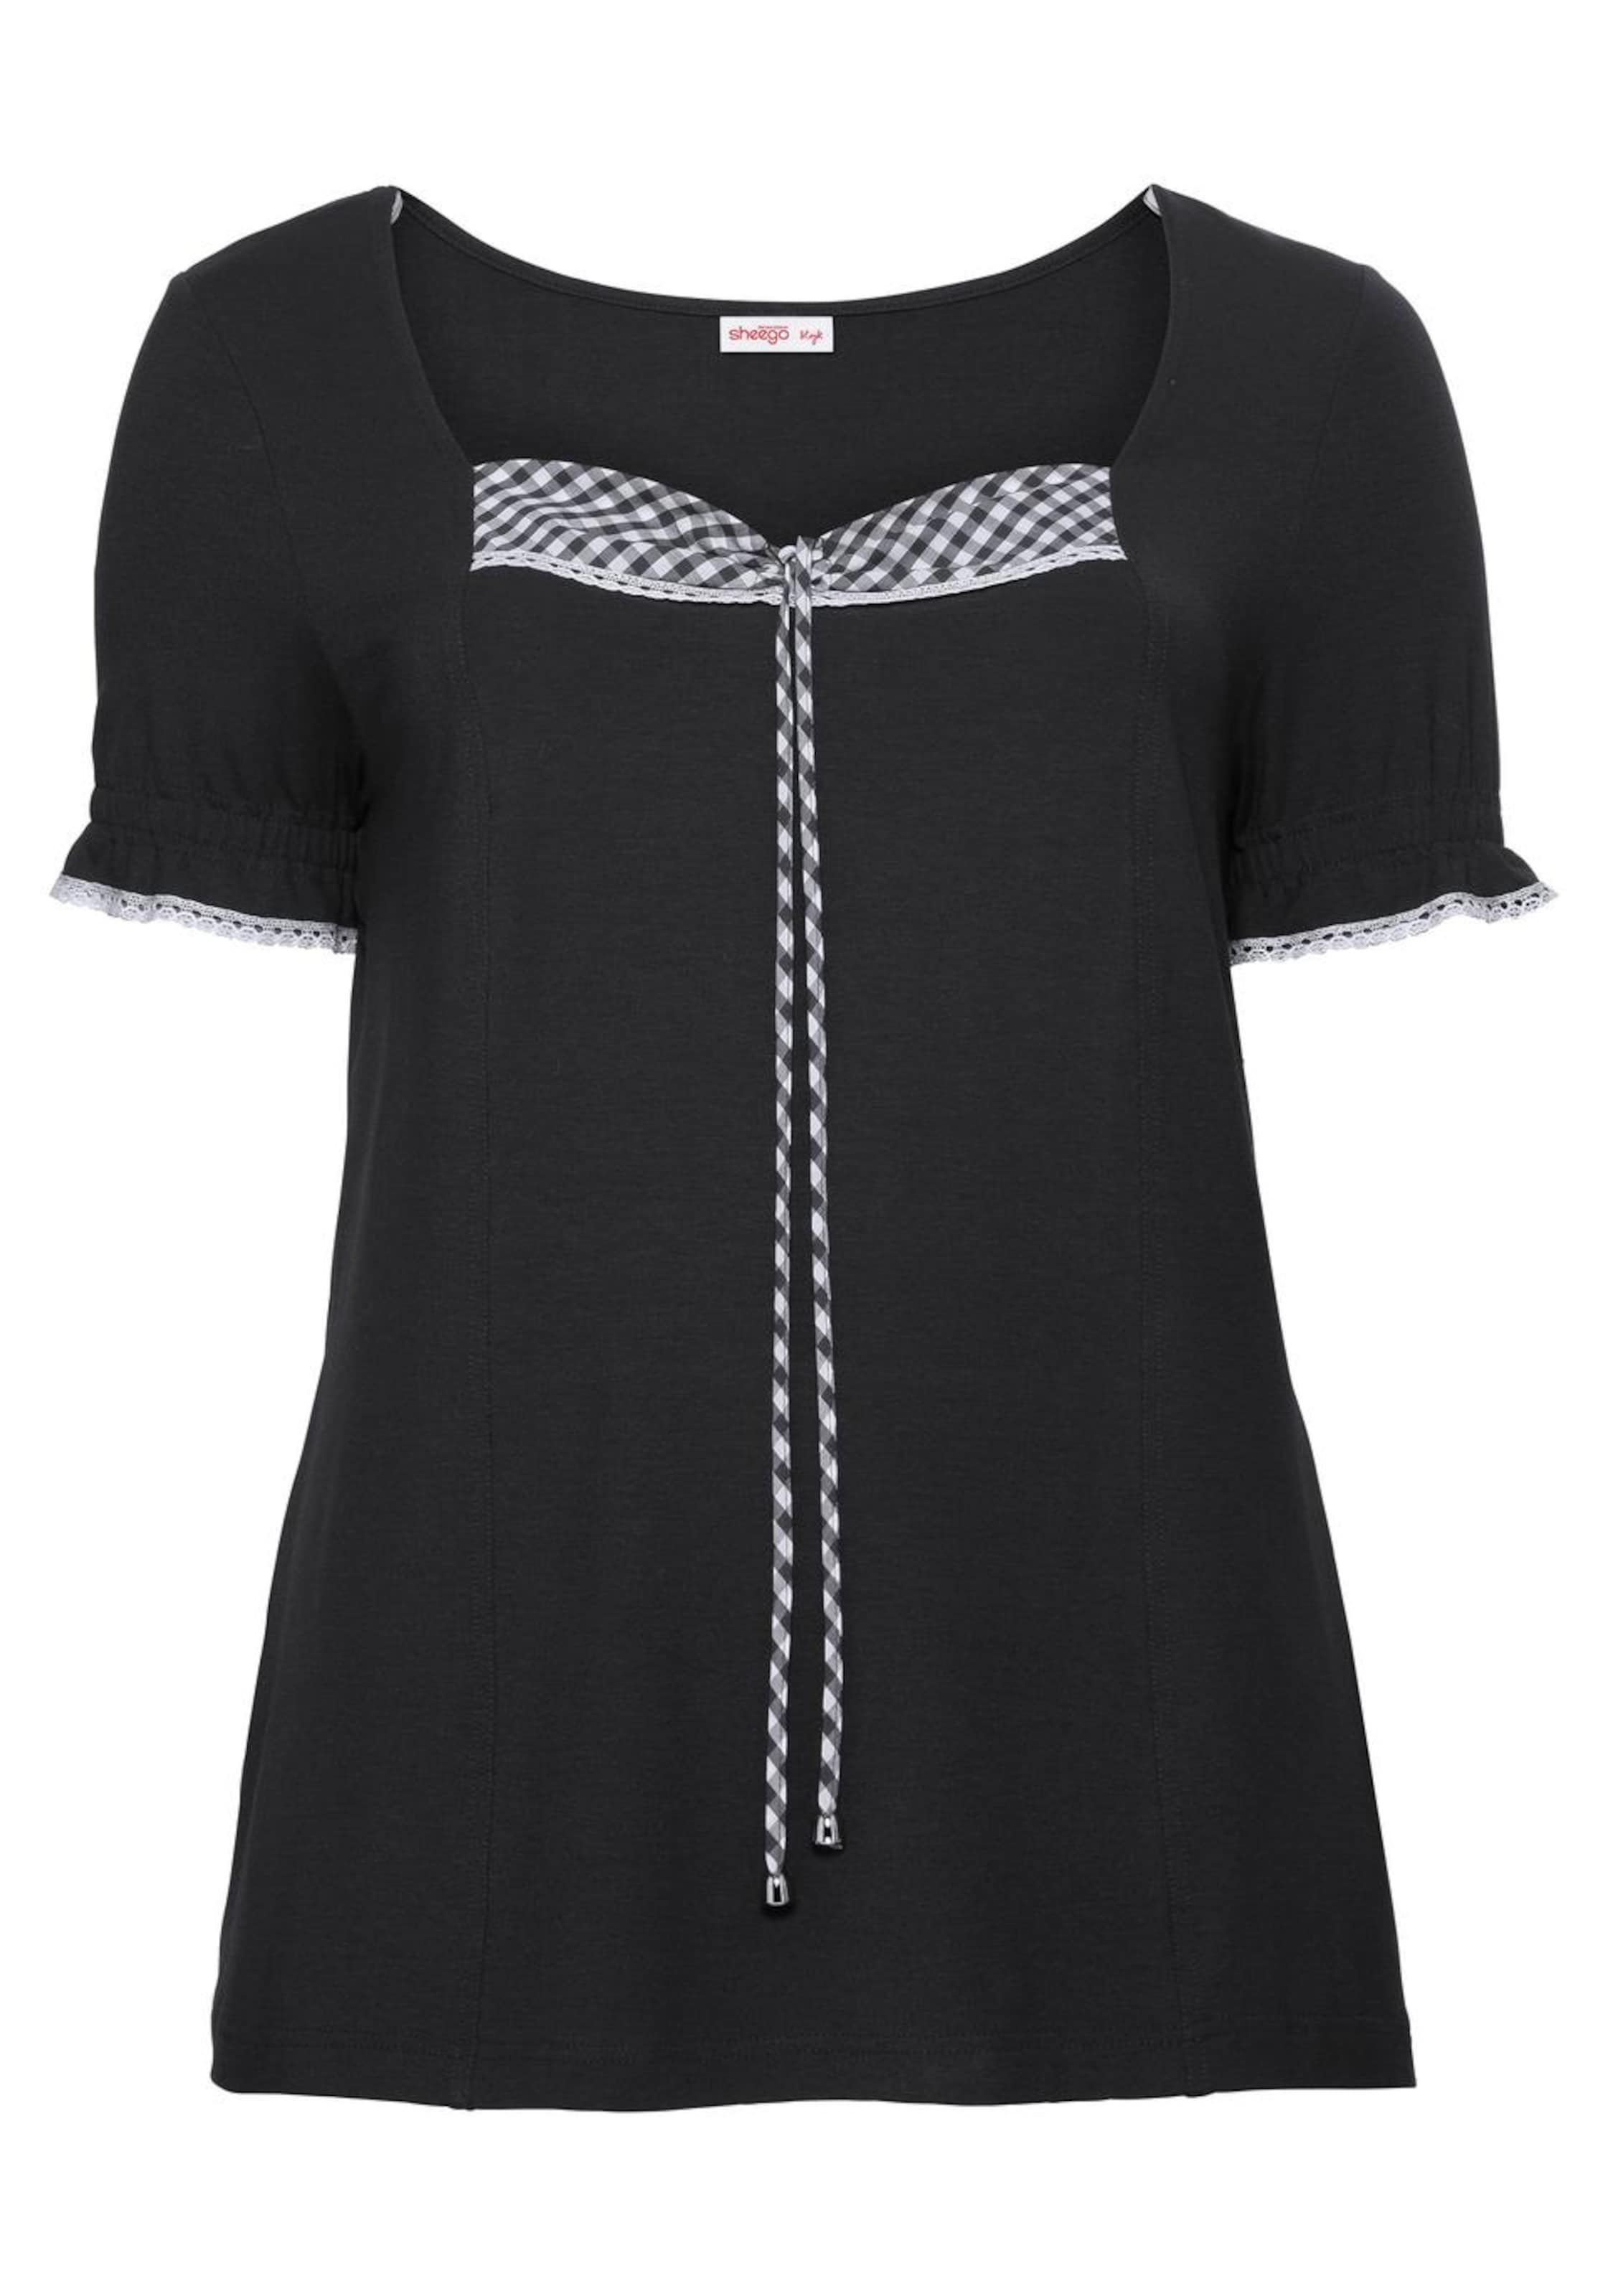 In Sheego Style SchwarzWeiß shirt T 54ALcqRj3